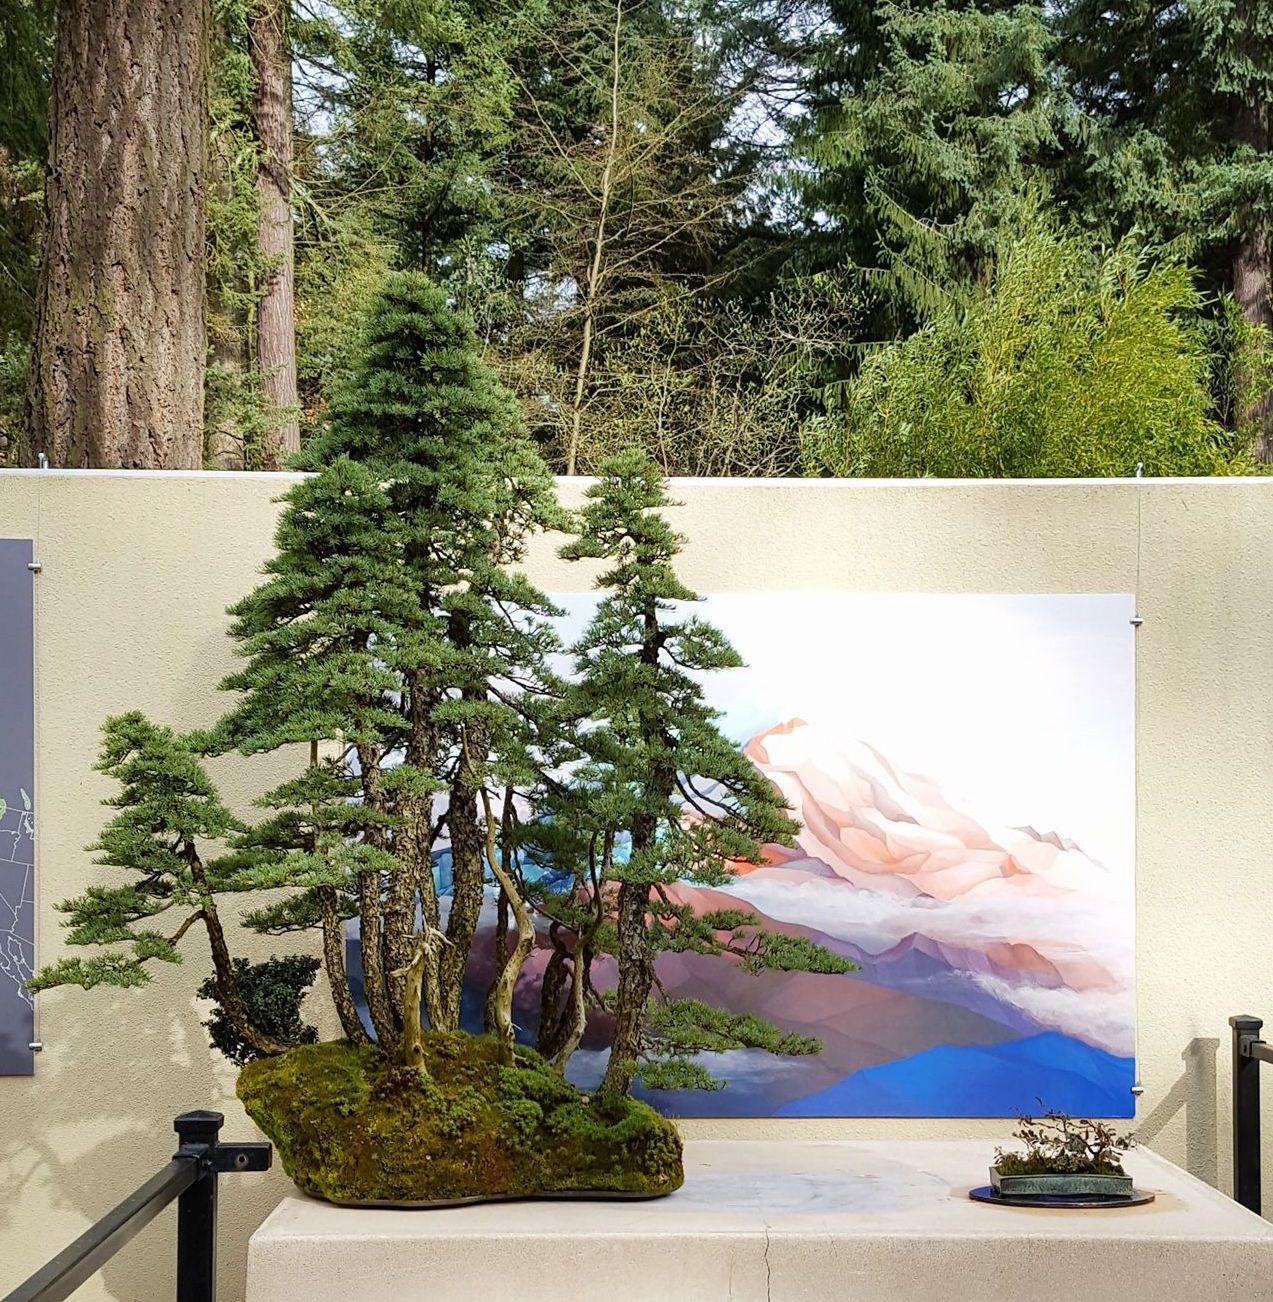 Mountain Hemlock By Michael Hagedorn Displayed At The Pacific Bonsai Museum S New Exhibit Natives Bonsai Indoor Bonsai Tree Bonsai Forest Zelkova Bonsai